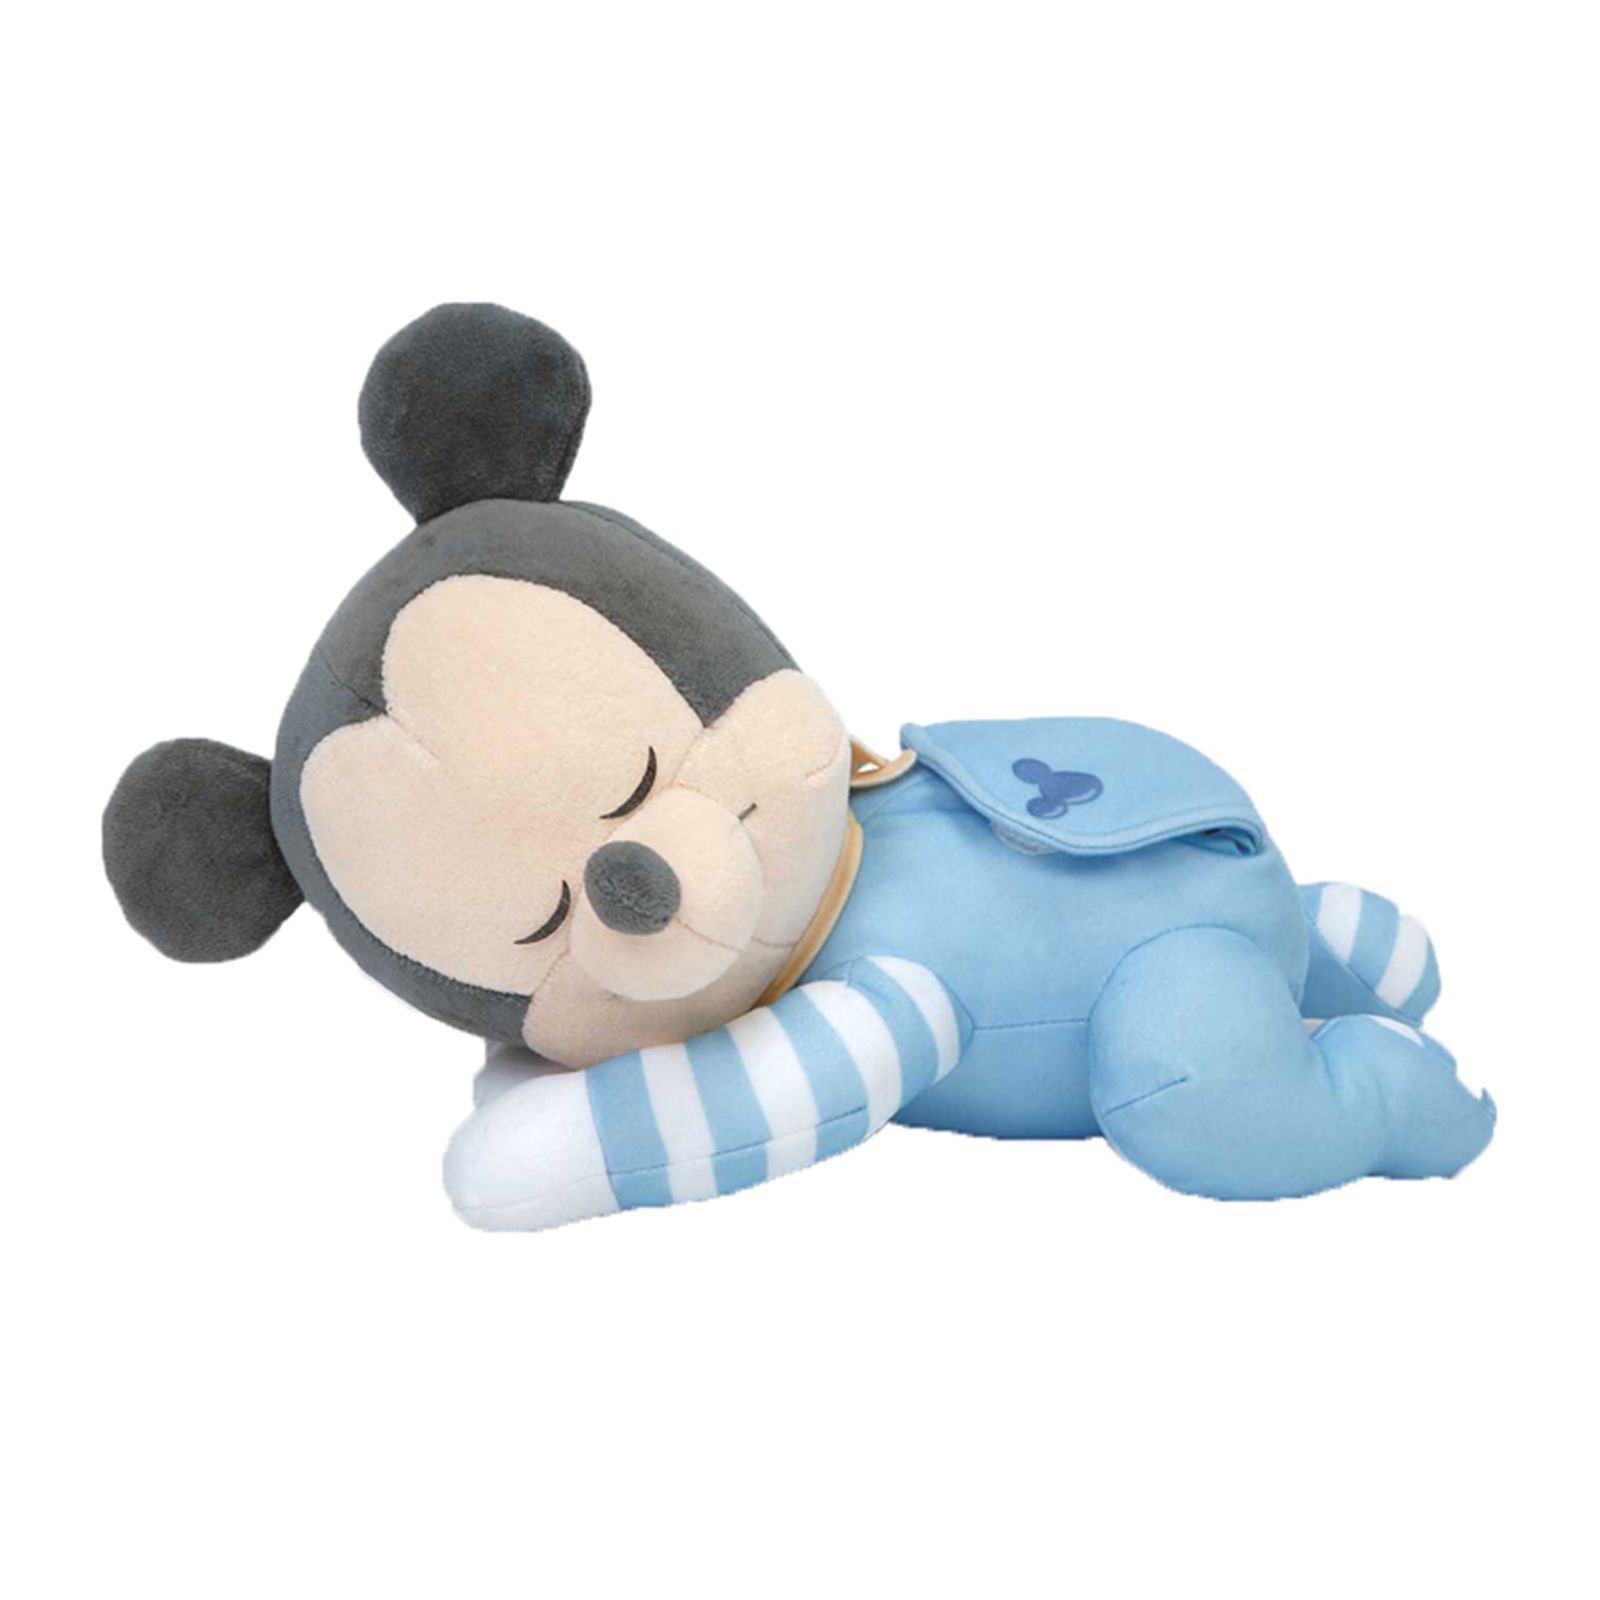 Tomy Disney Suya Suya Melody Baby Mickey